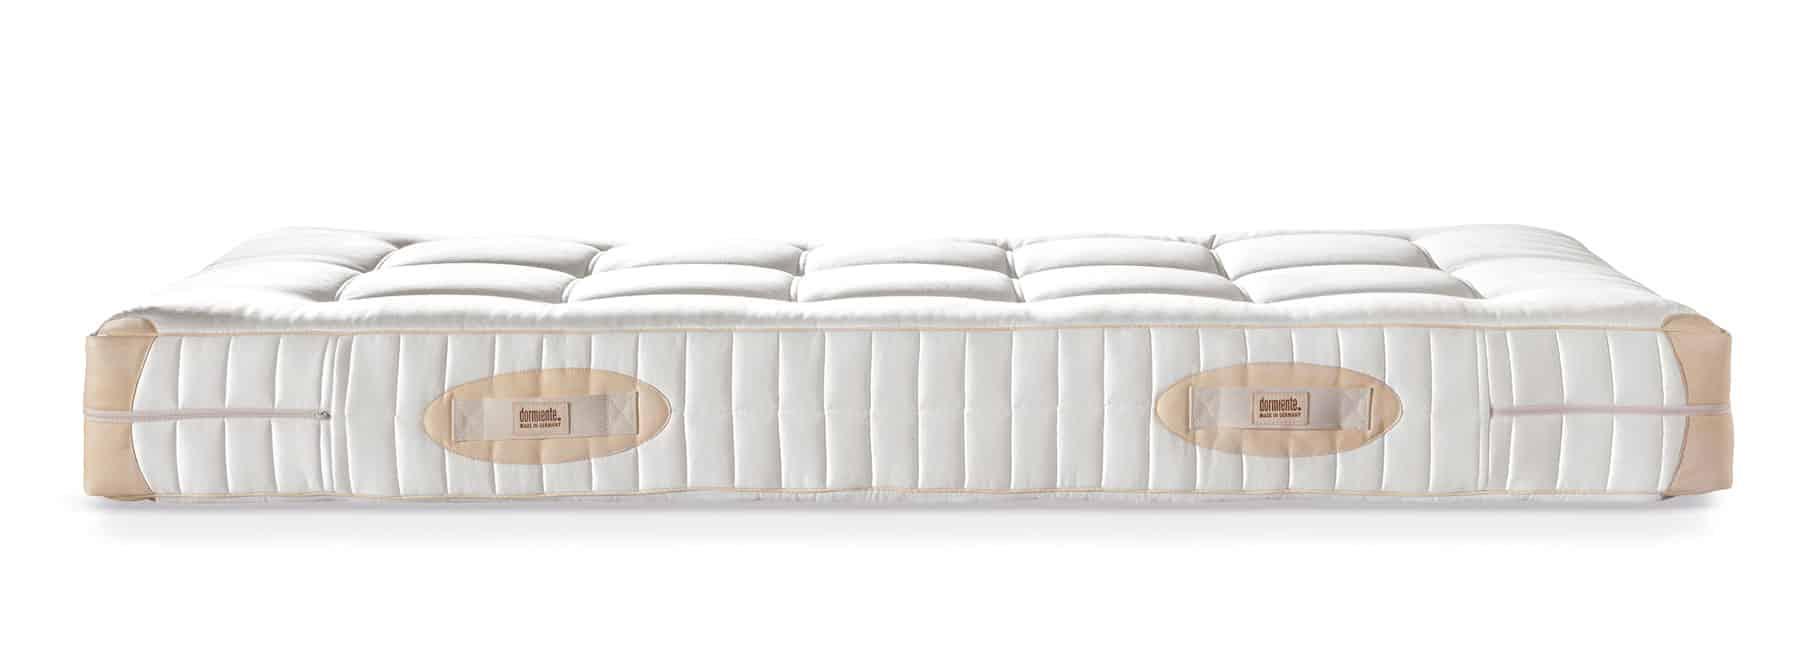 DormeinteNaturalDeluxe_BEZUG-1A-SATINEE_Seite_